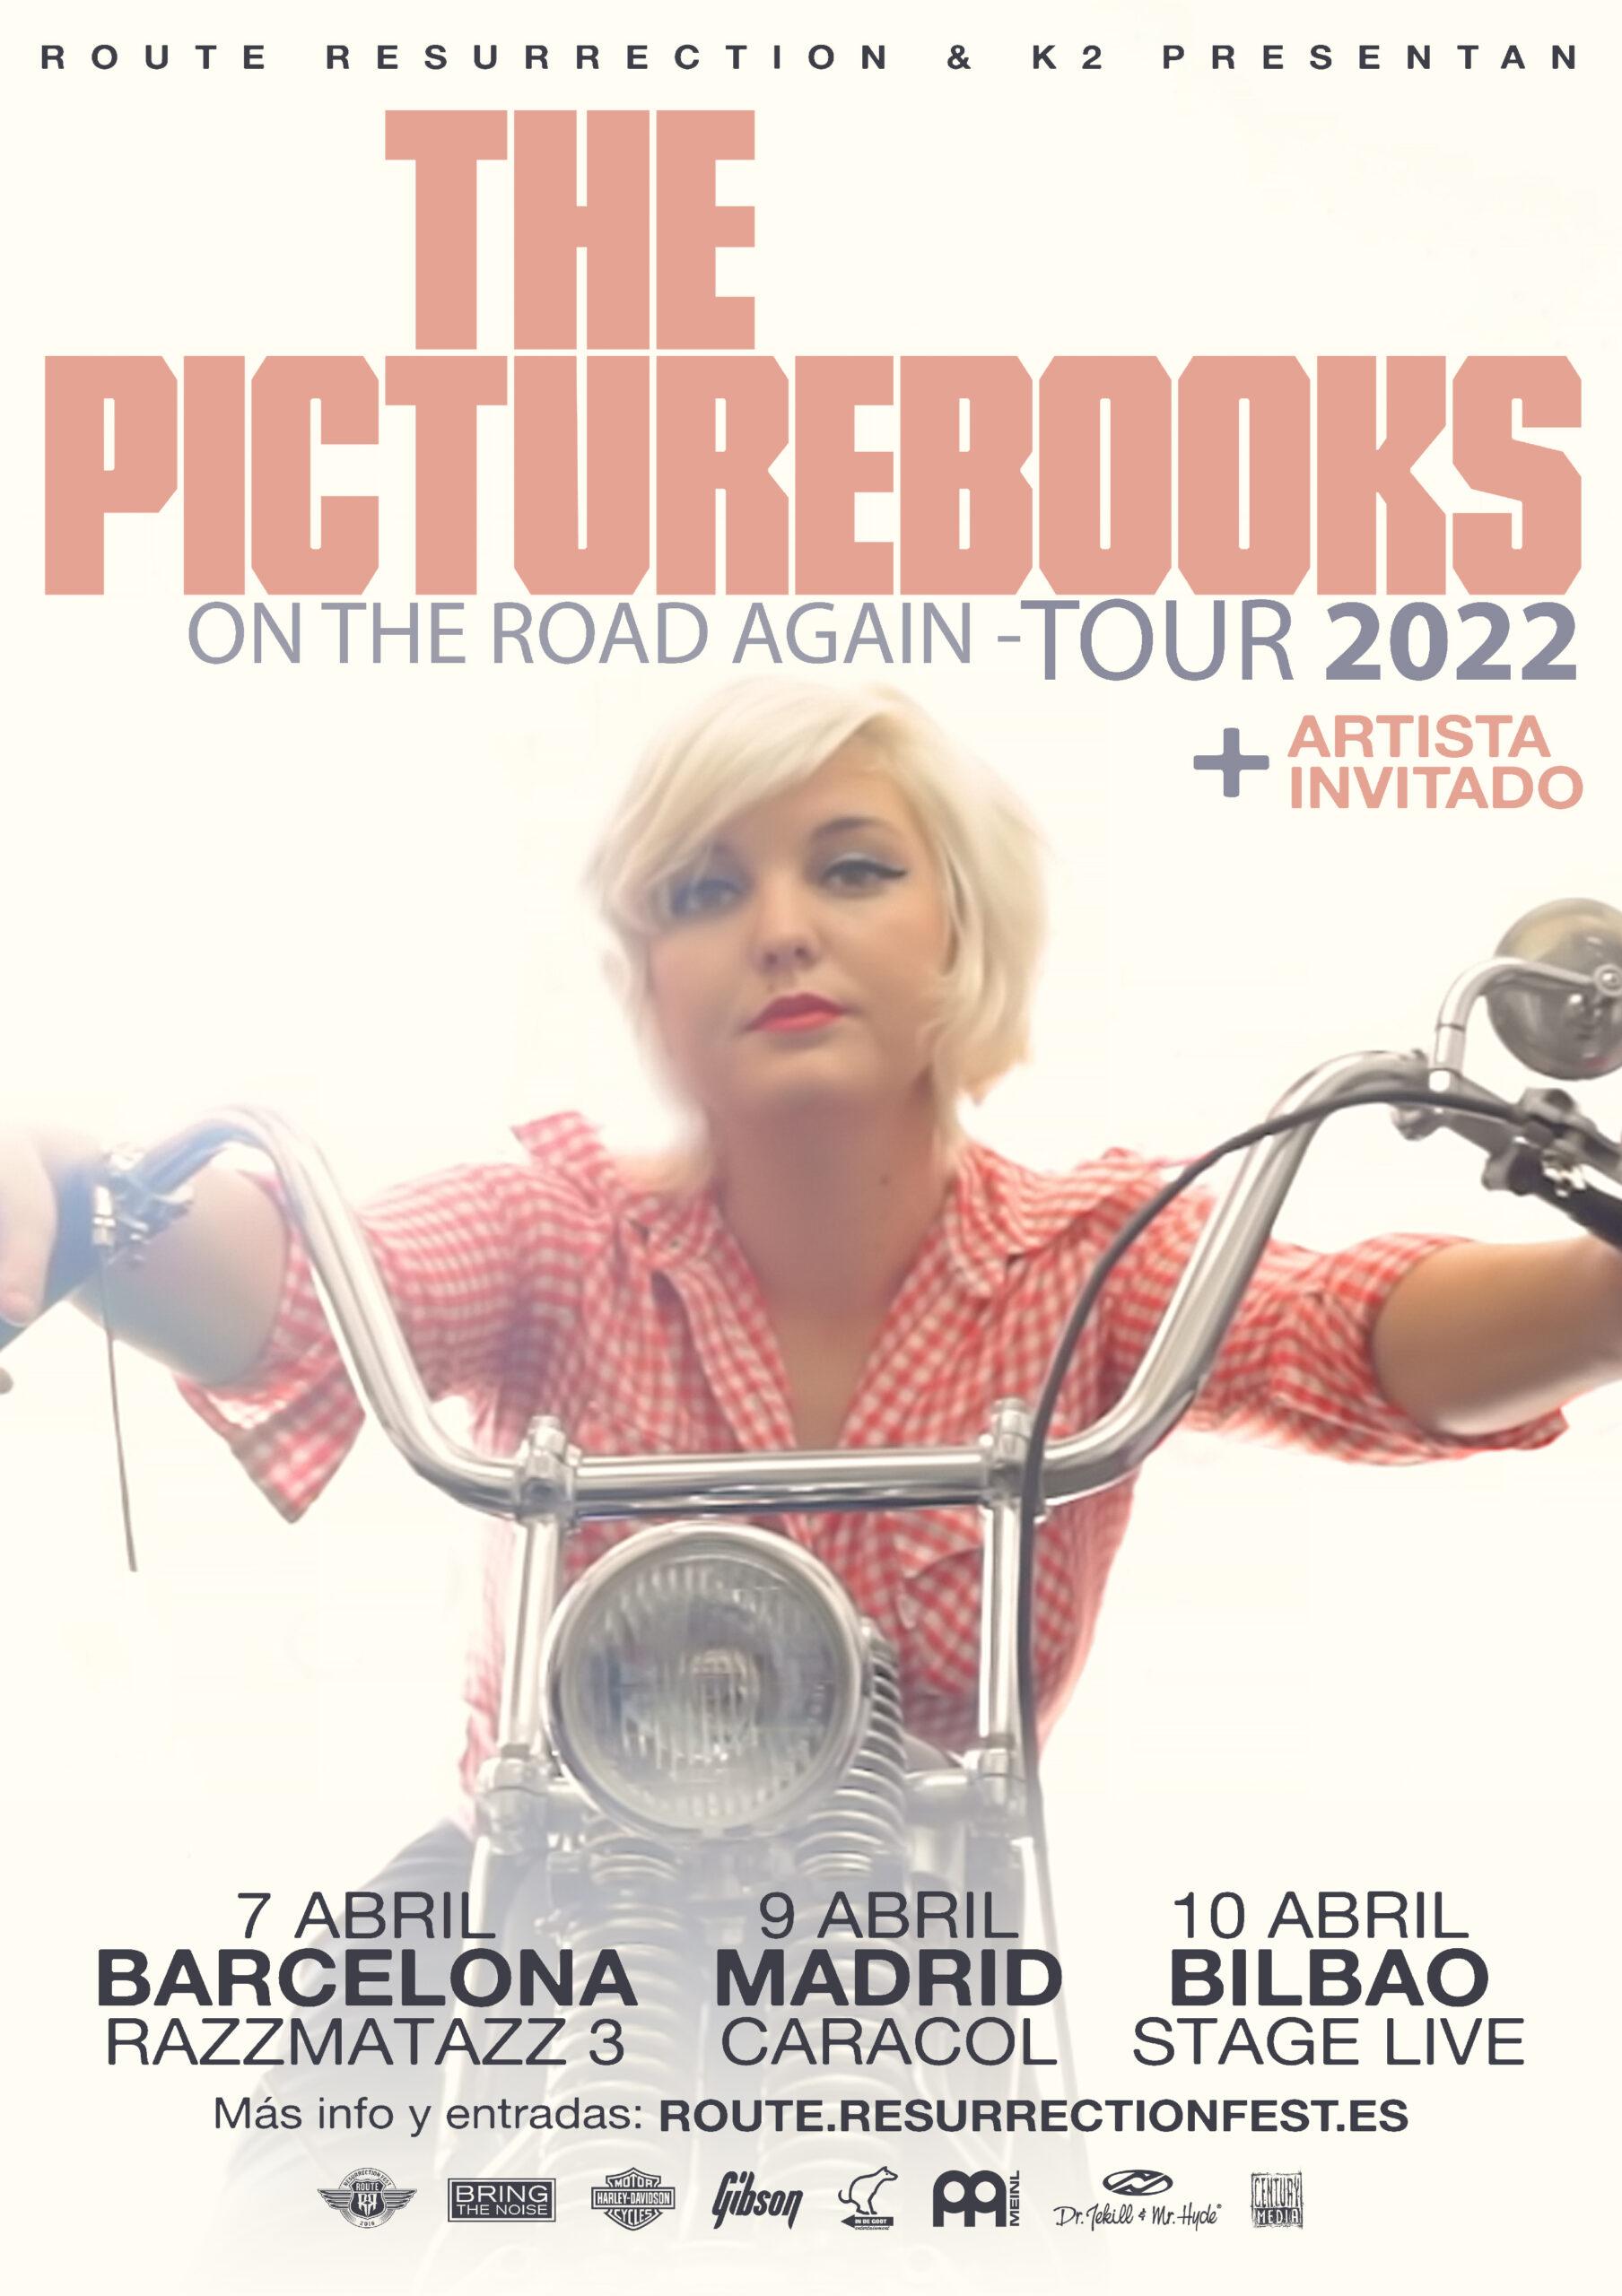 Route Resurrection: The Picturebooks (Madrid)